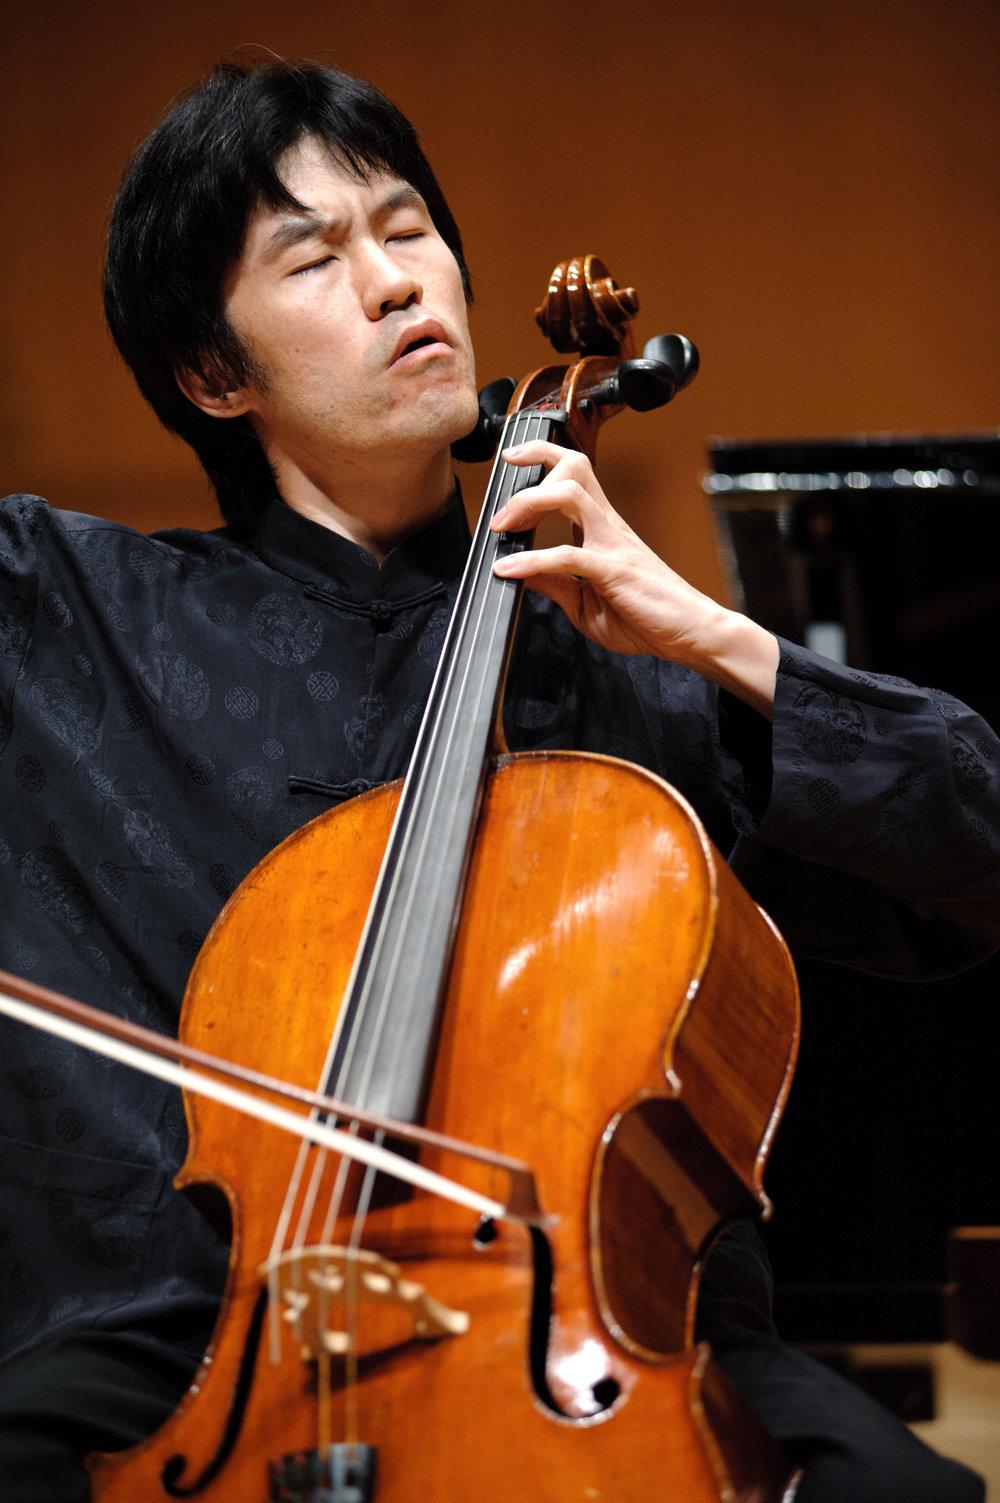 Cheung Chau - Beijing Concert hall 8.08.2011.jpg